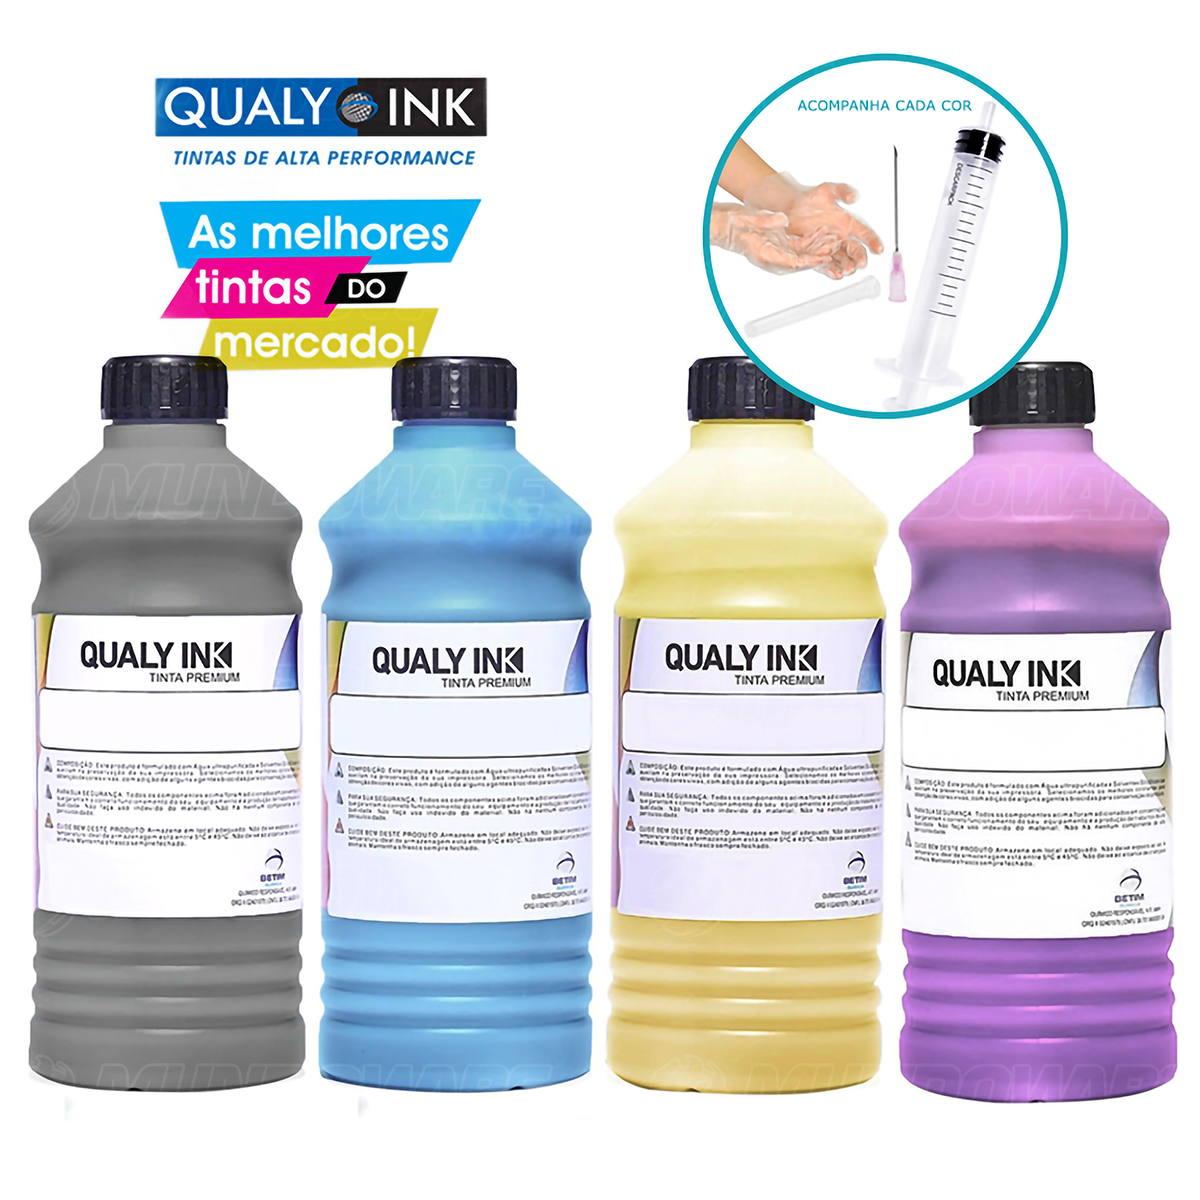 Compatível: Kit 4 Cores Tinta Qualy-Ink para Recarga de Cartuchos HP série 3000 BK Pigmentada CMY Corante 4 de 1L